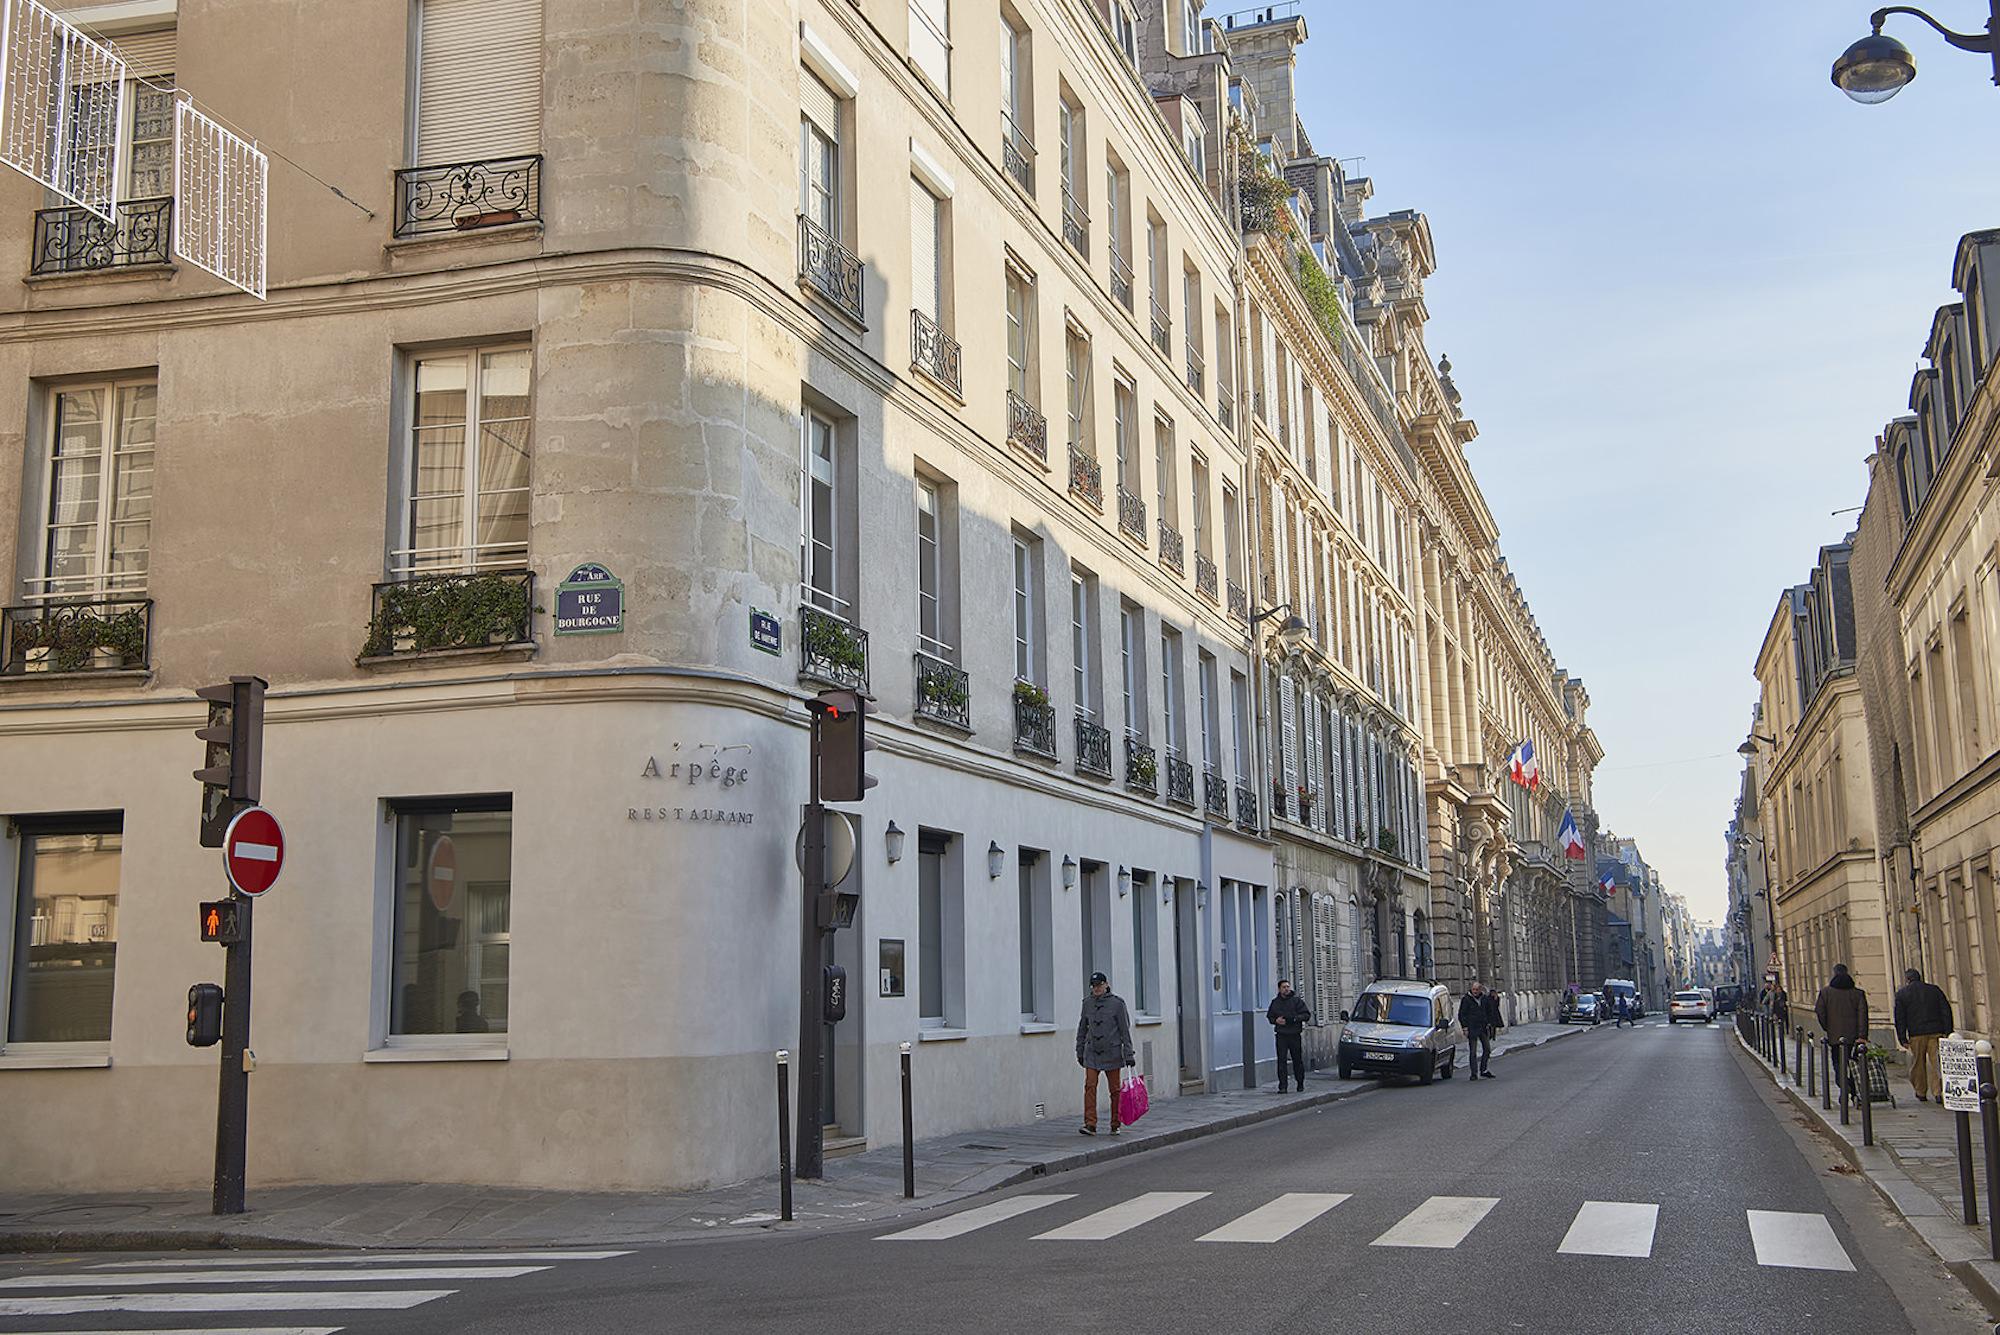 Arpège street